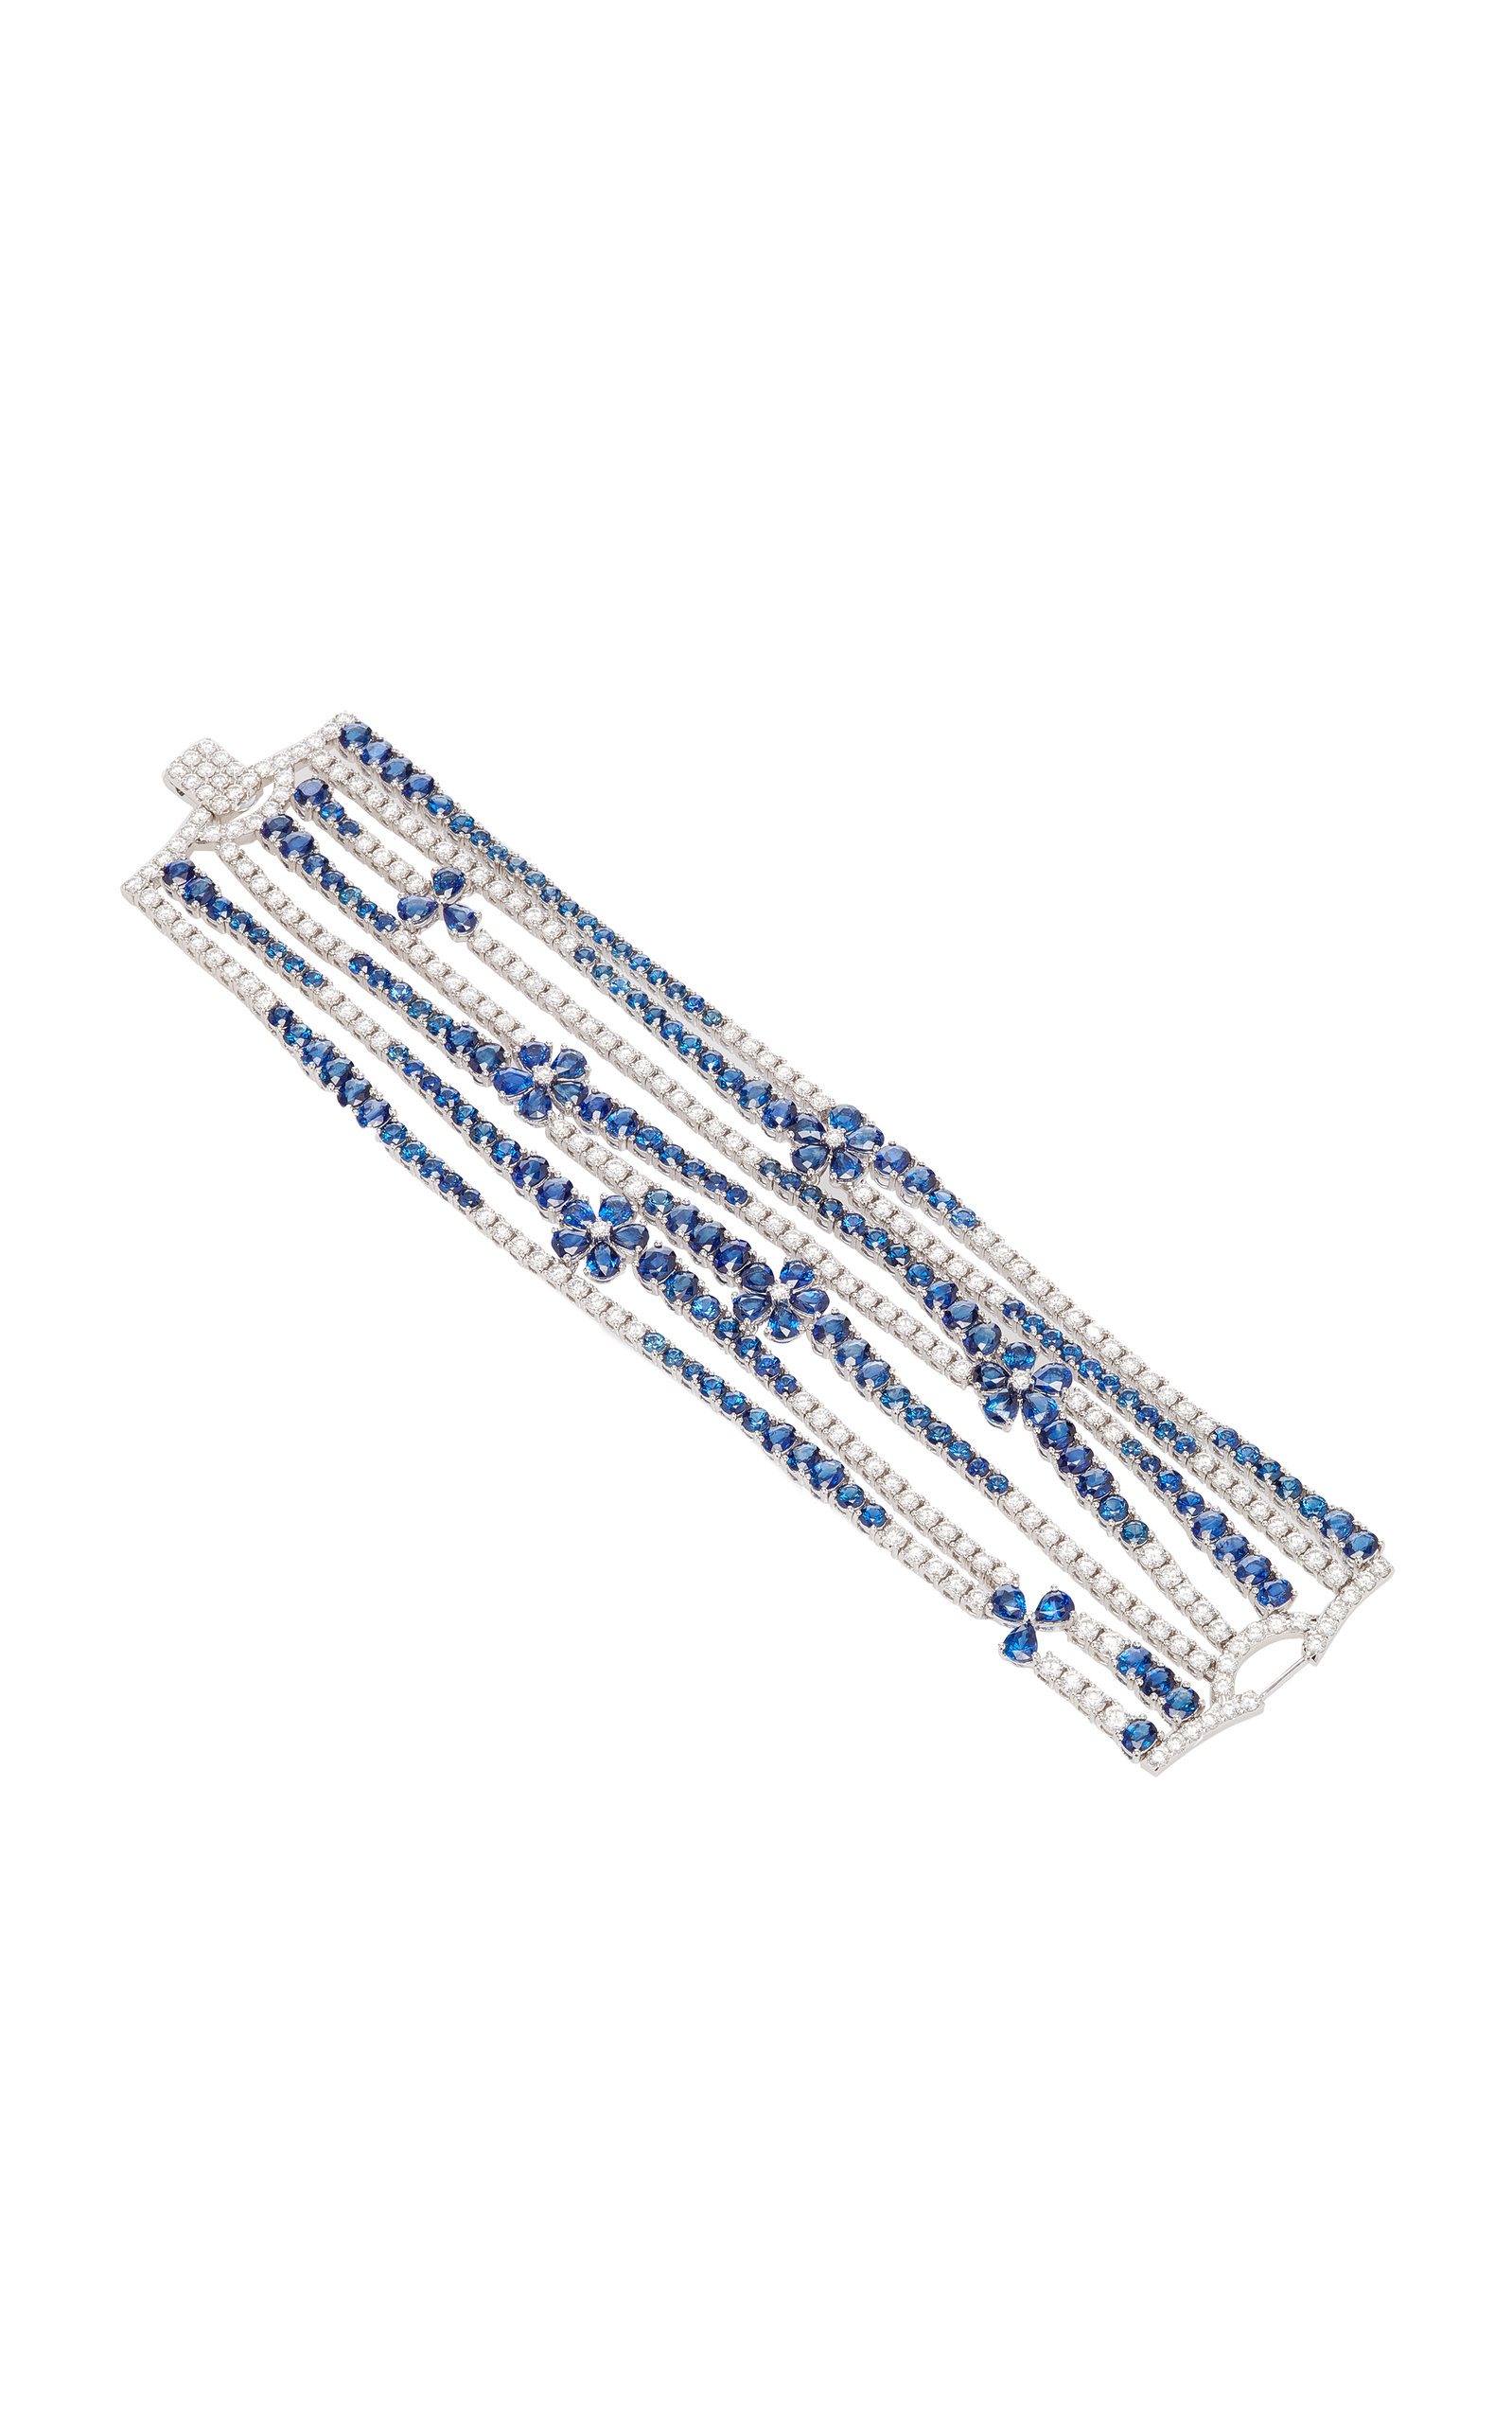 SABBADINI White Gold Diamond And Sapphire Bracelet in Blue